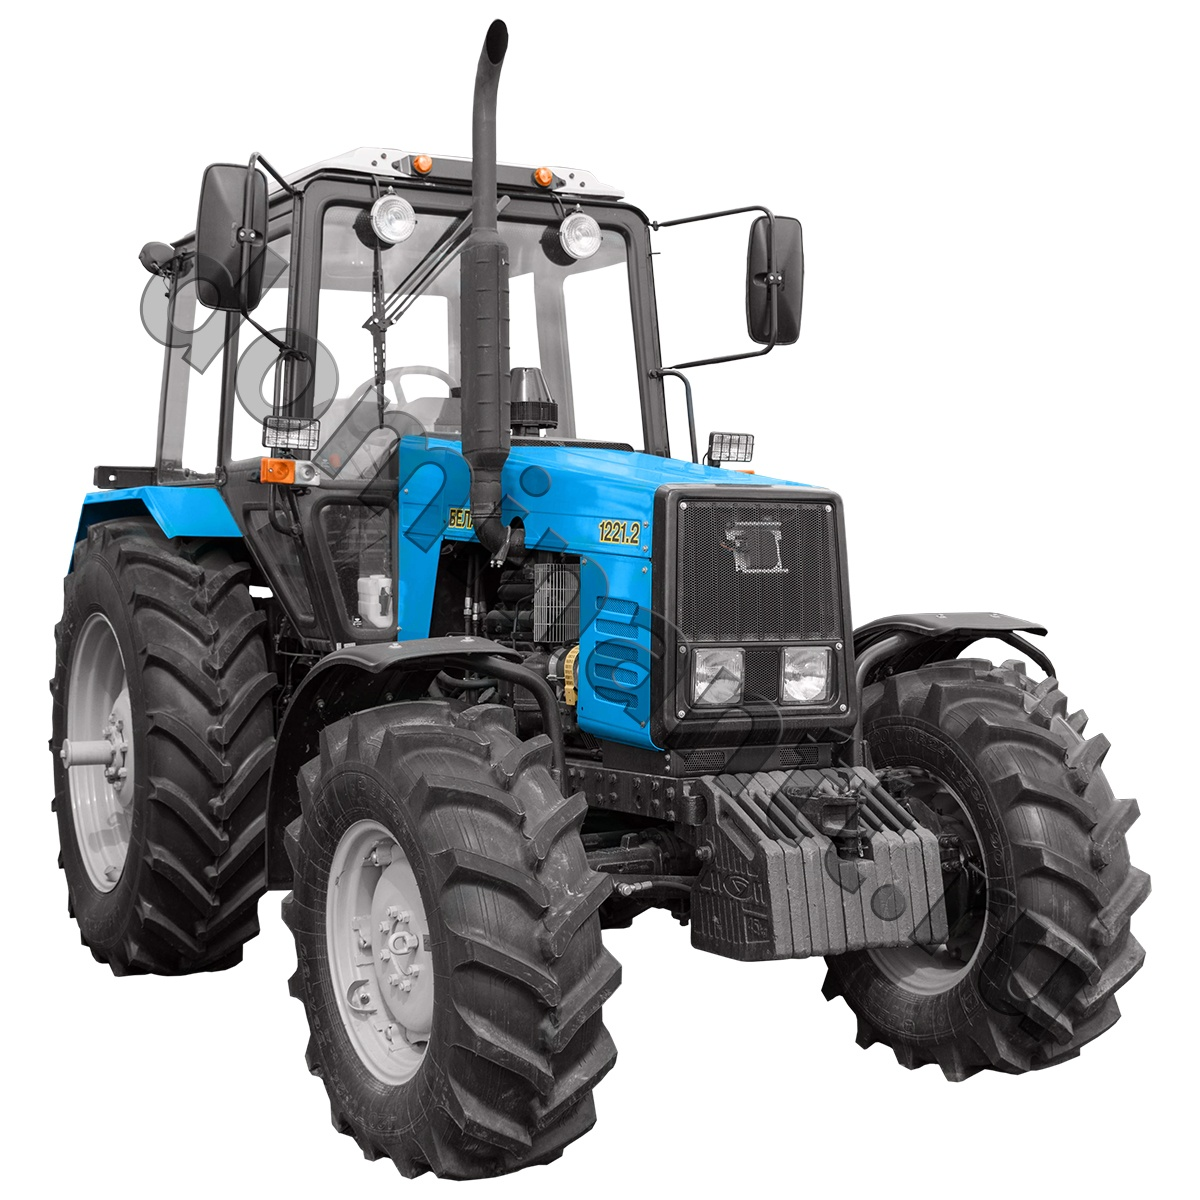 Трактор МТЗ 920 Технические характеристики погрузчика.